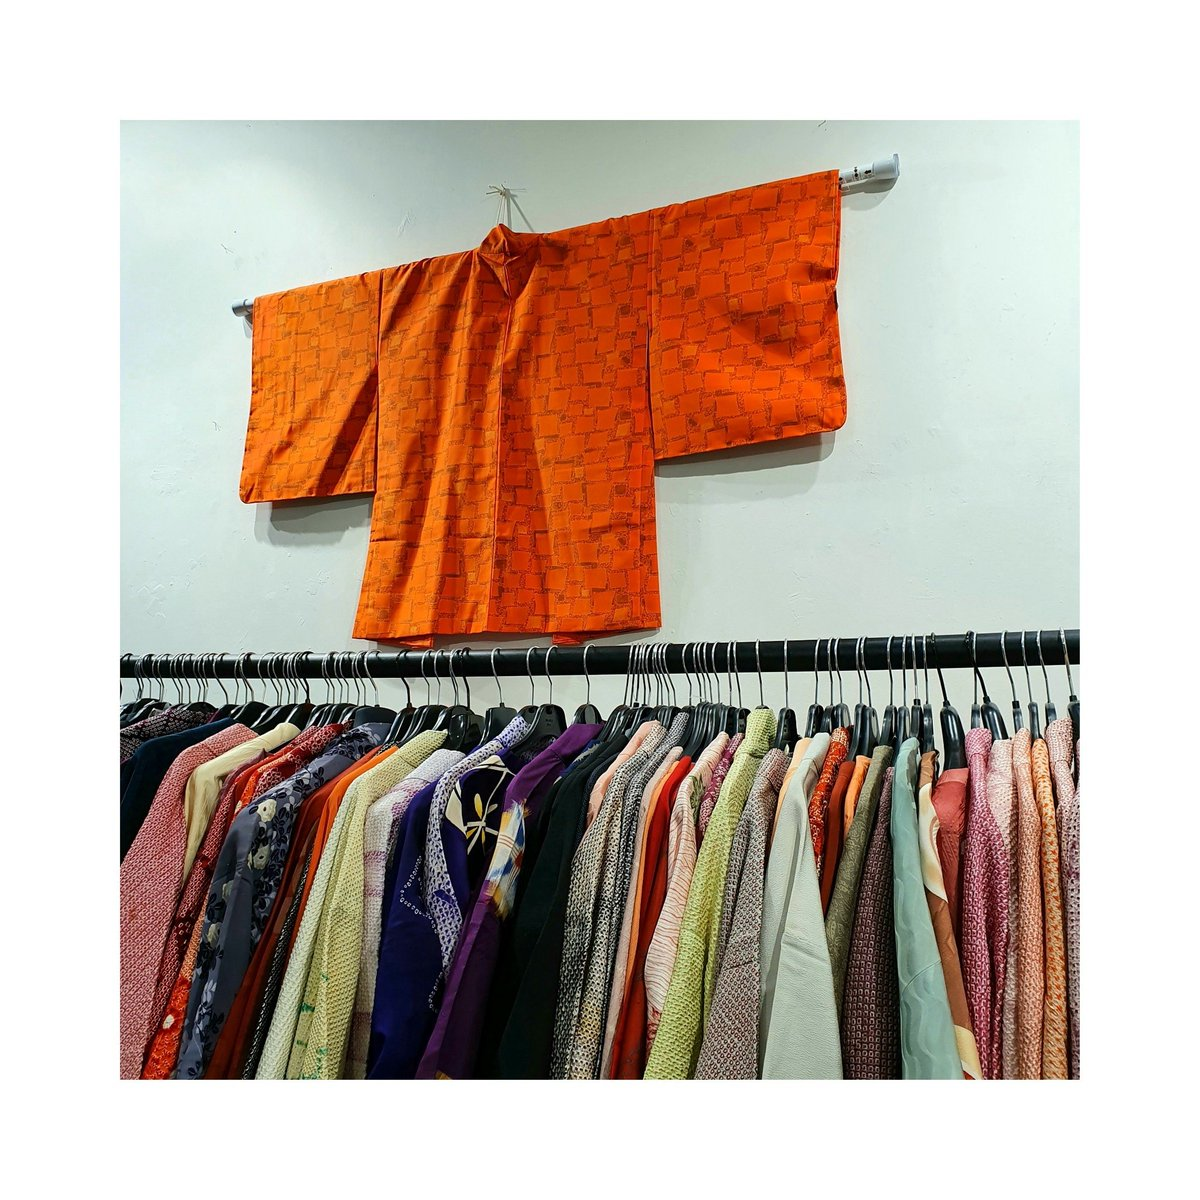 Selection of vintage #haori available at Sway Gallery London! Prices start at £80  #swaygallery #kimono #haori #traditional #jacket #japan #gallery #fabric #london #oldstreet #design #fashion #silk #vintagekimono #japanesefashion #vintagehaori #conceptstore #ロンドン #ootdpic.twitter.com/CGWLGLzwHN